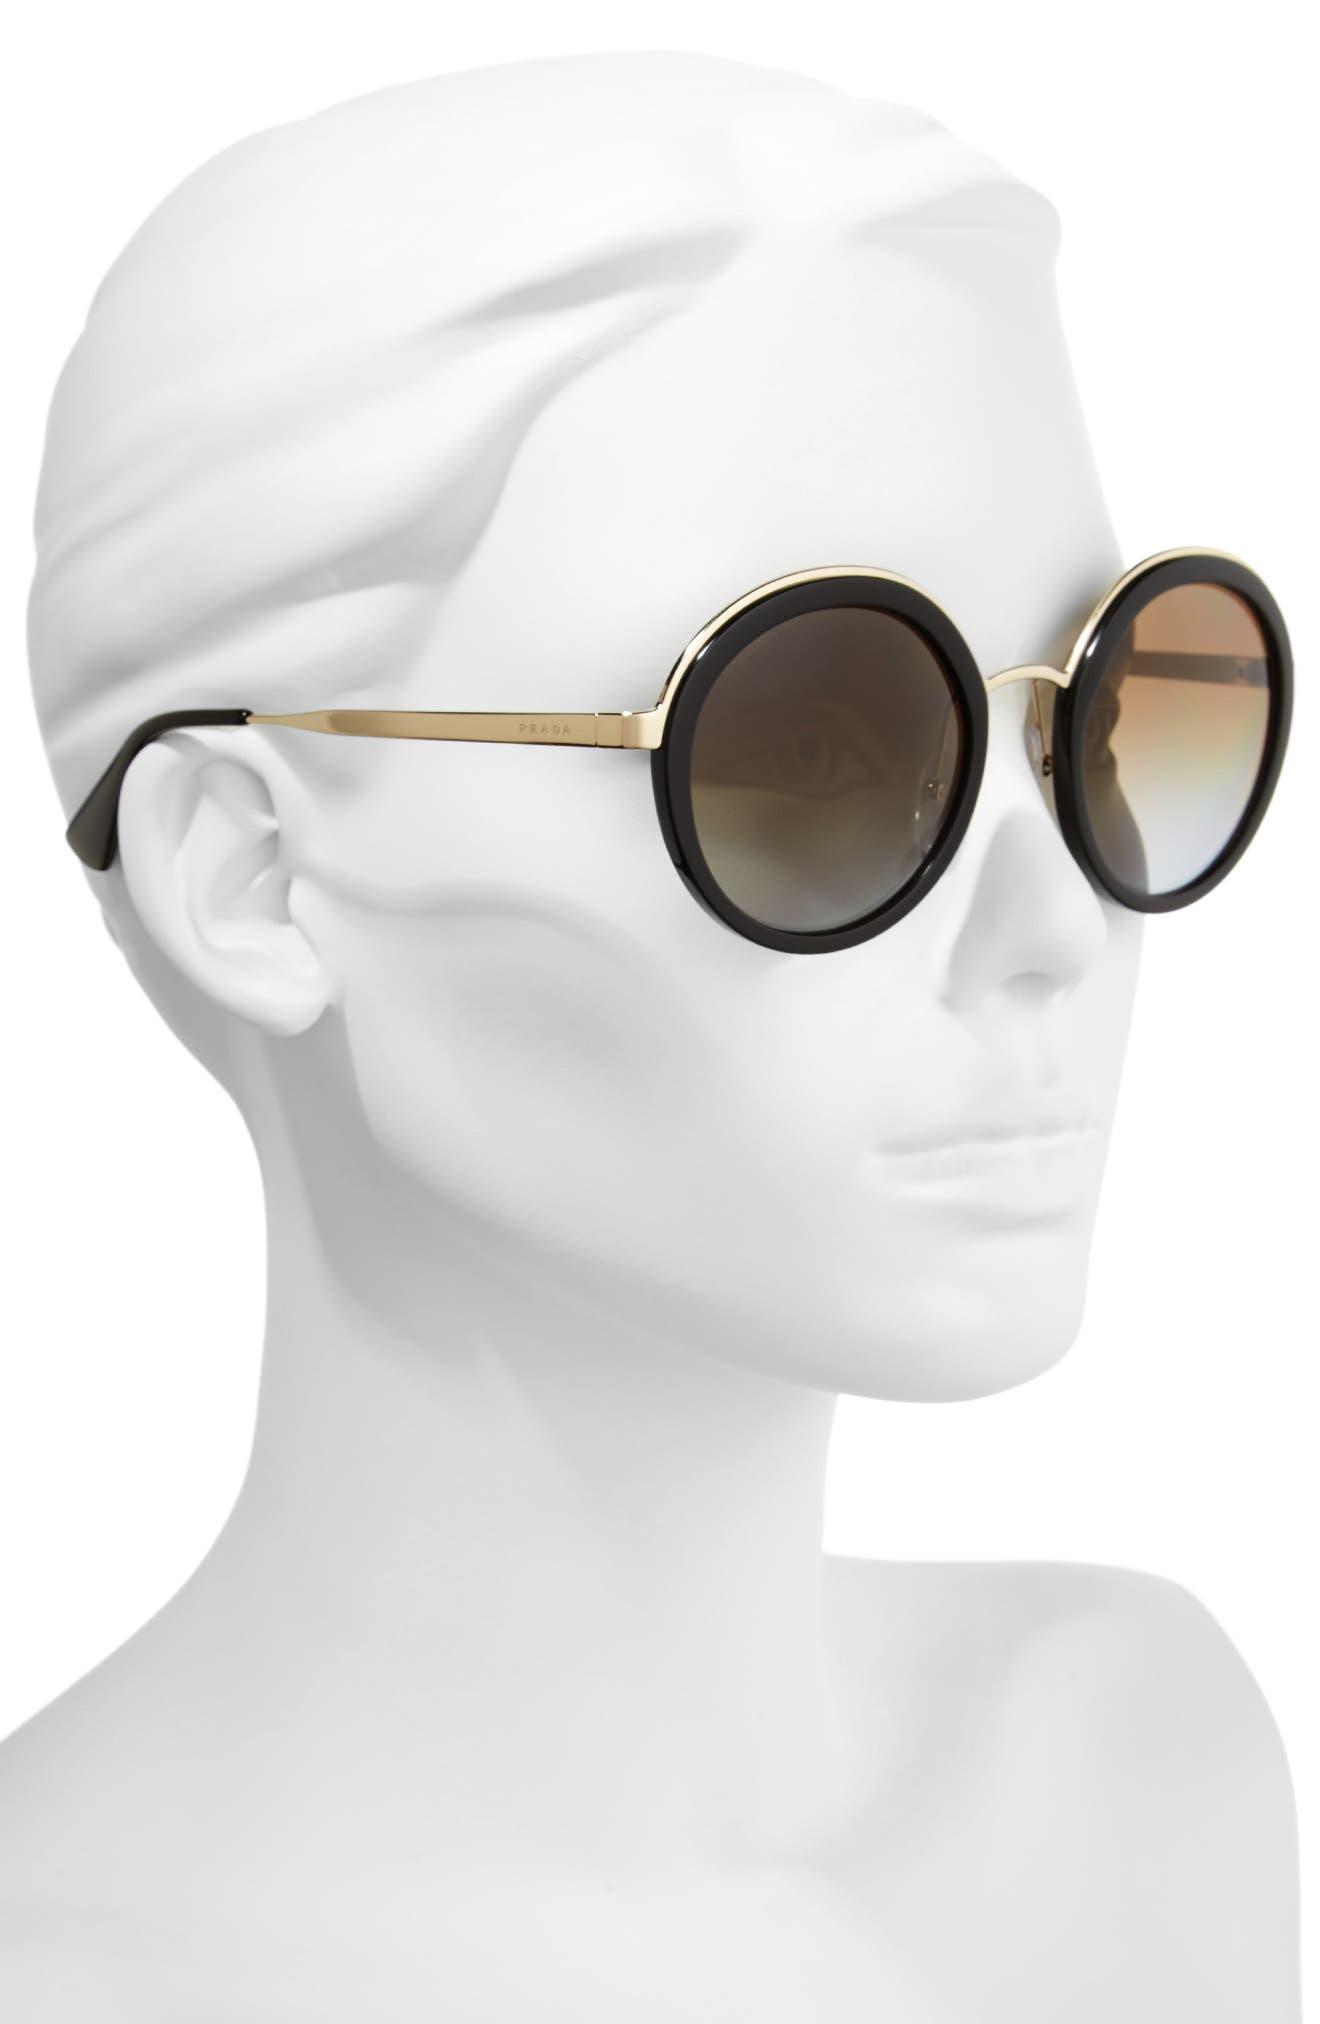 54mm Polarized Round Sunglasses,                             Alternate thumbnail 2, color,                             001